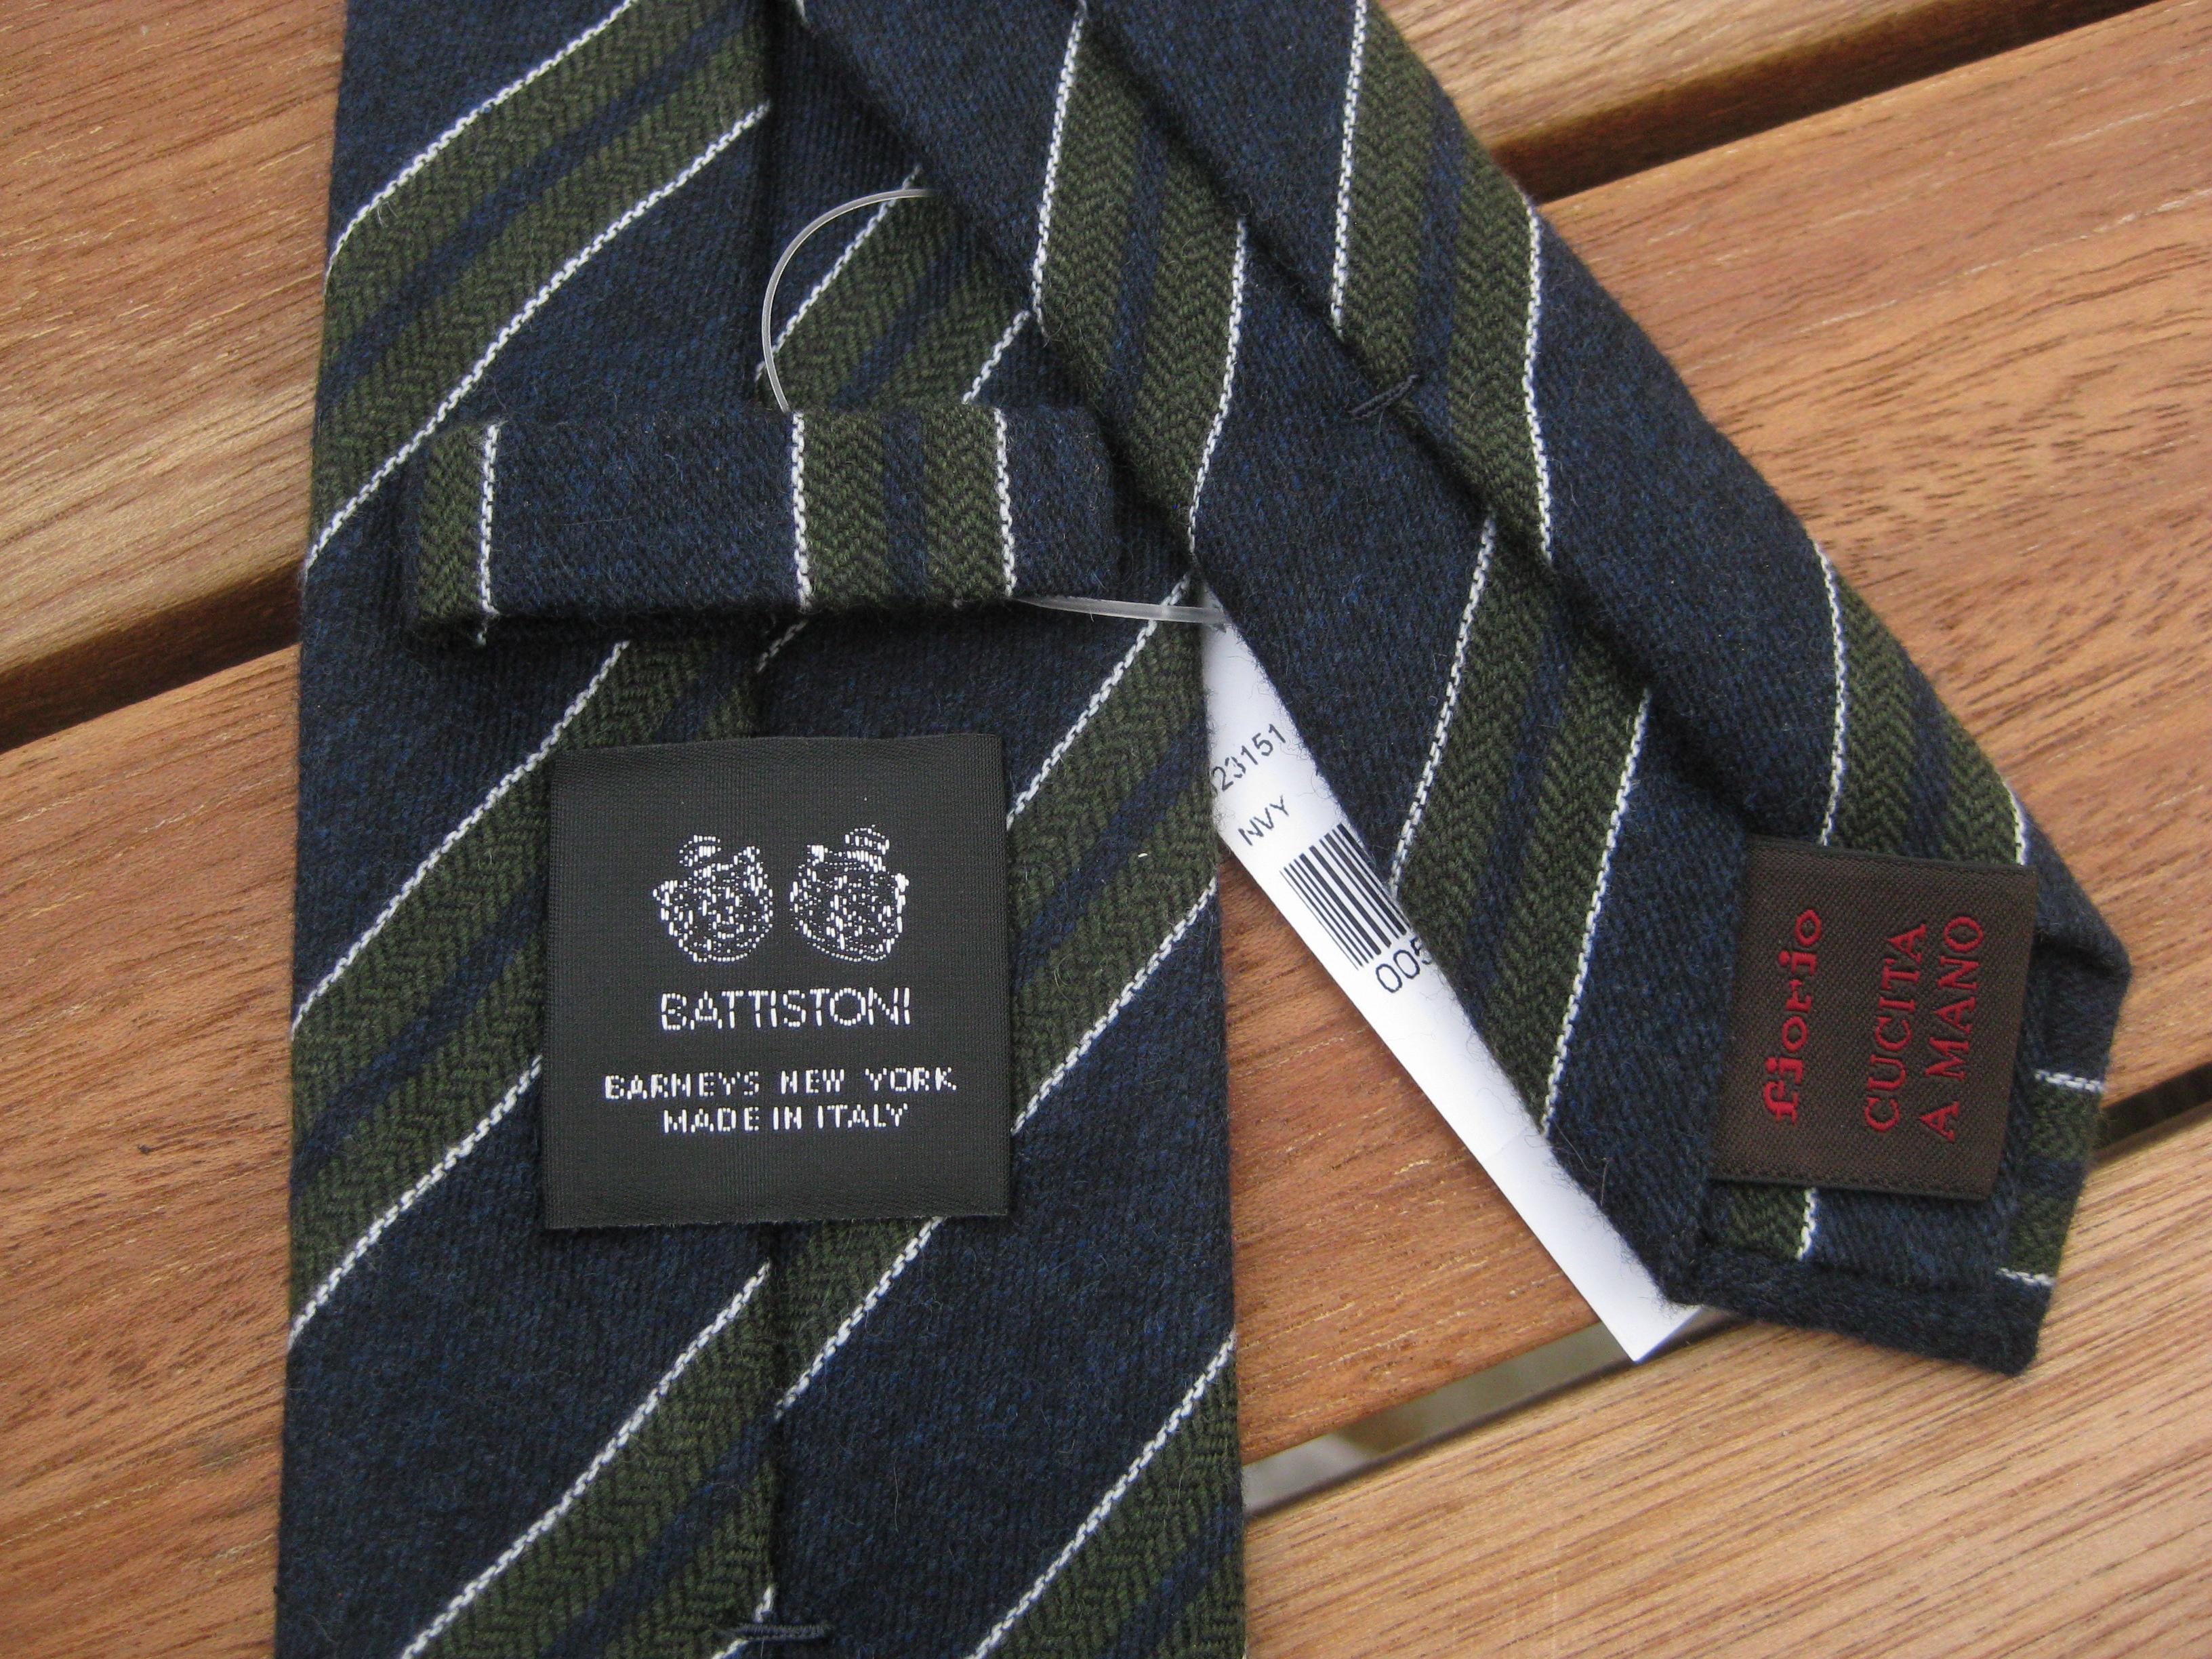 The High End Tie Thread Kiton Brioni Charvet Borrelli